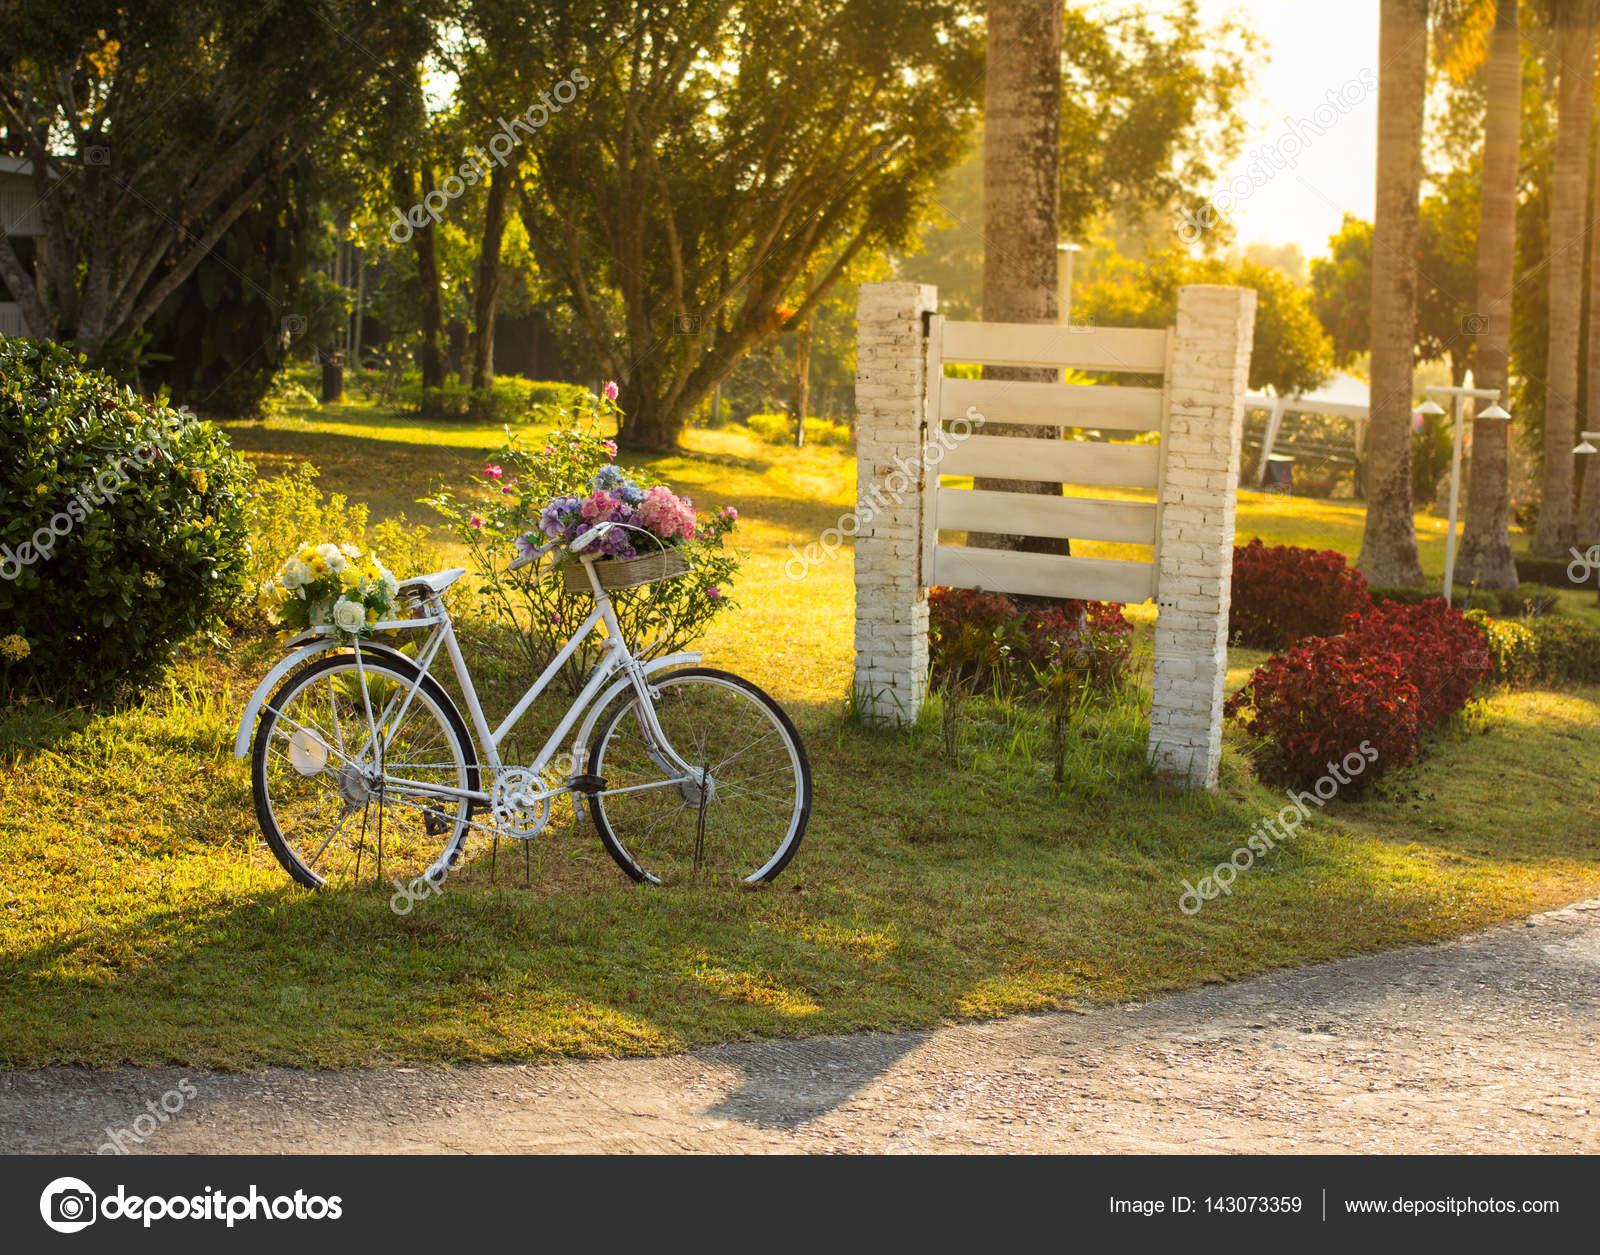 Vintage bicycle decoration in garden — Stock Photo © samsam62 #143073359